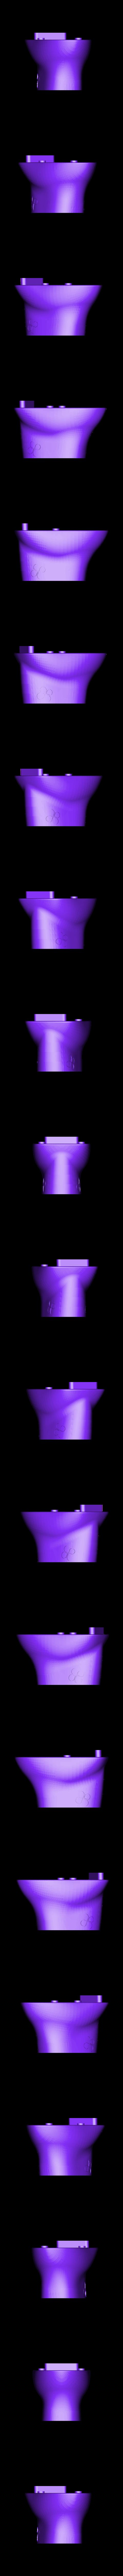 86Duino-Toilet-1.STL Download free STL file 86Duino Toilet • 3D printable object, 86Duino